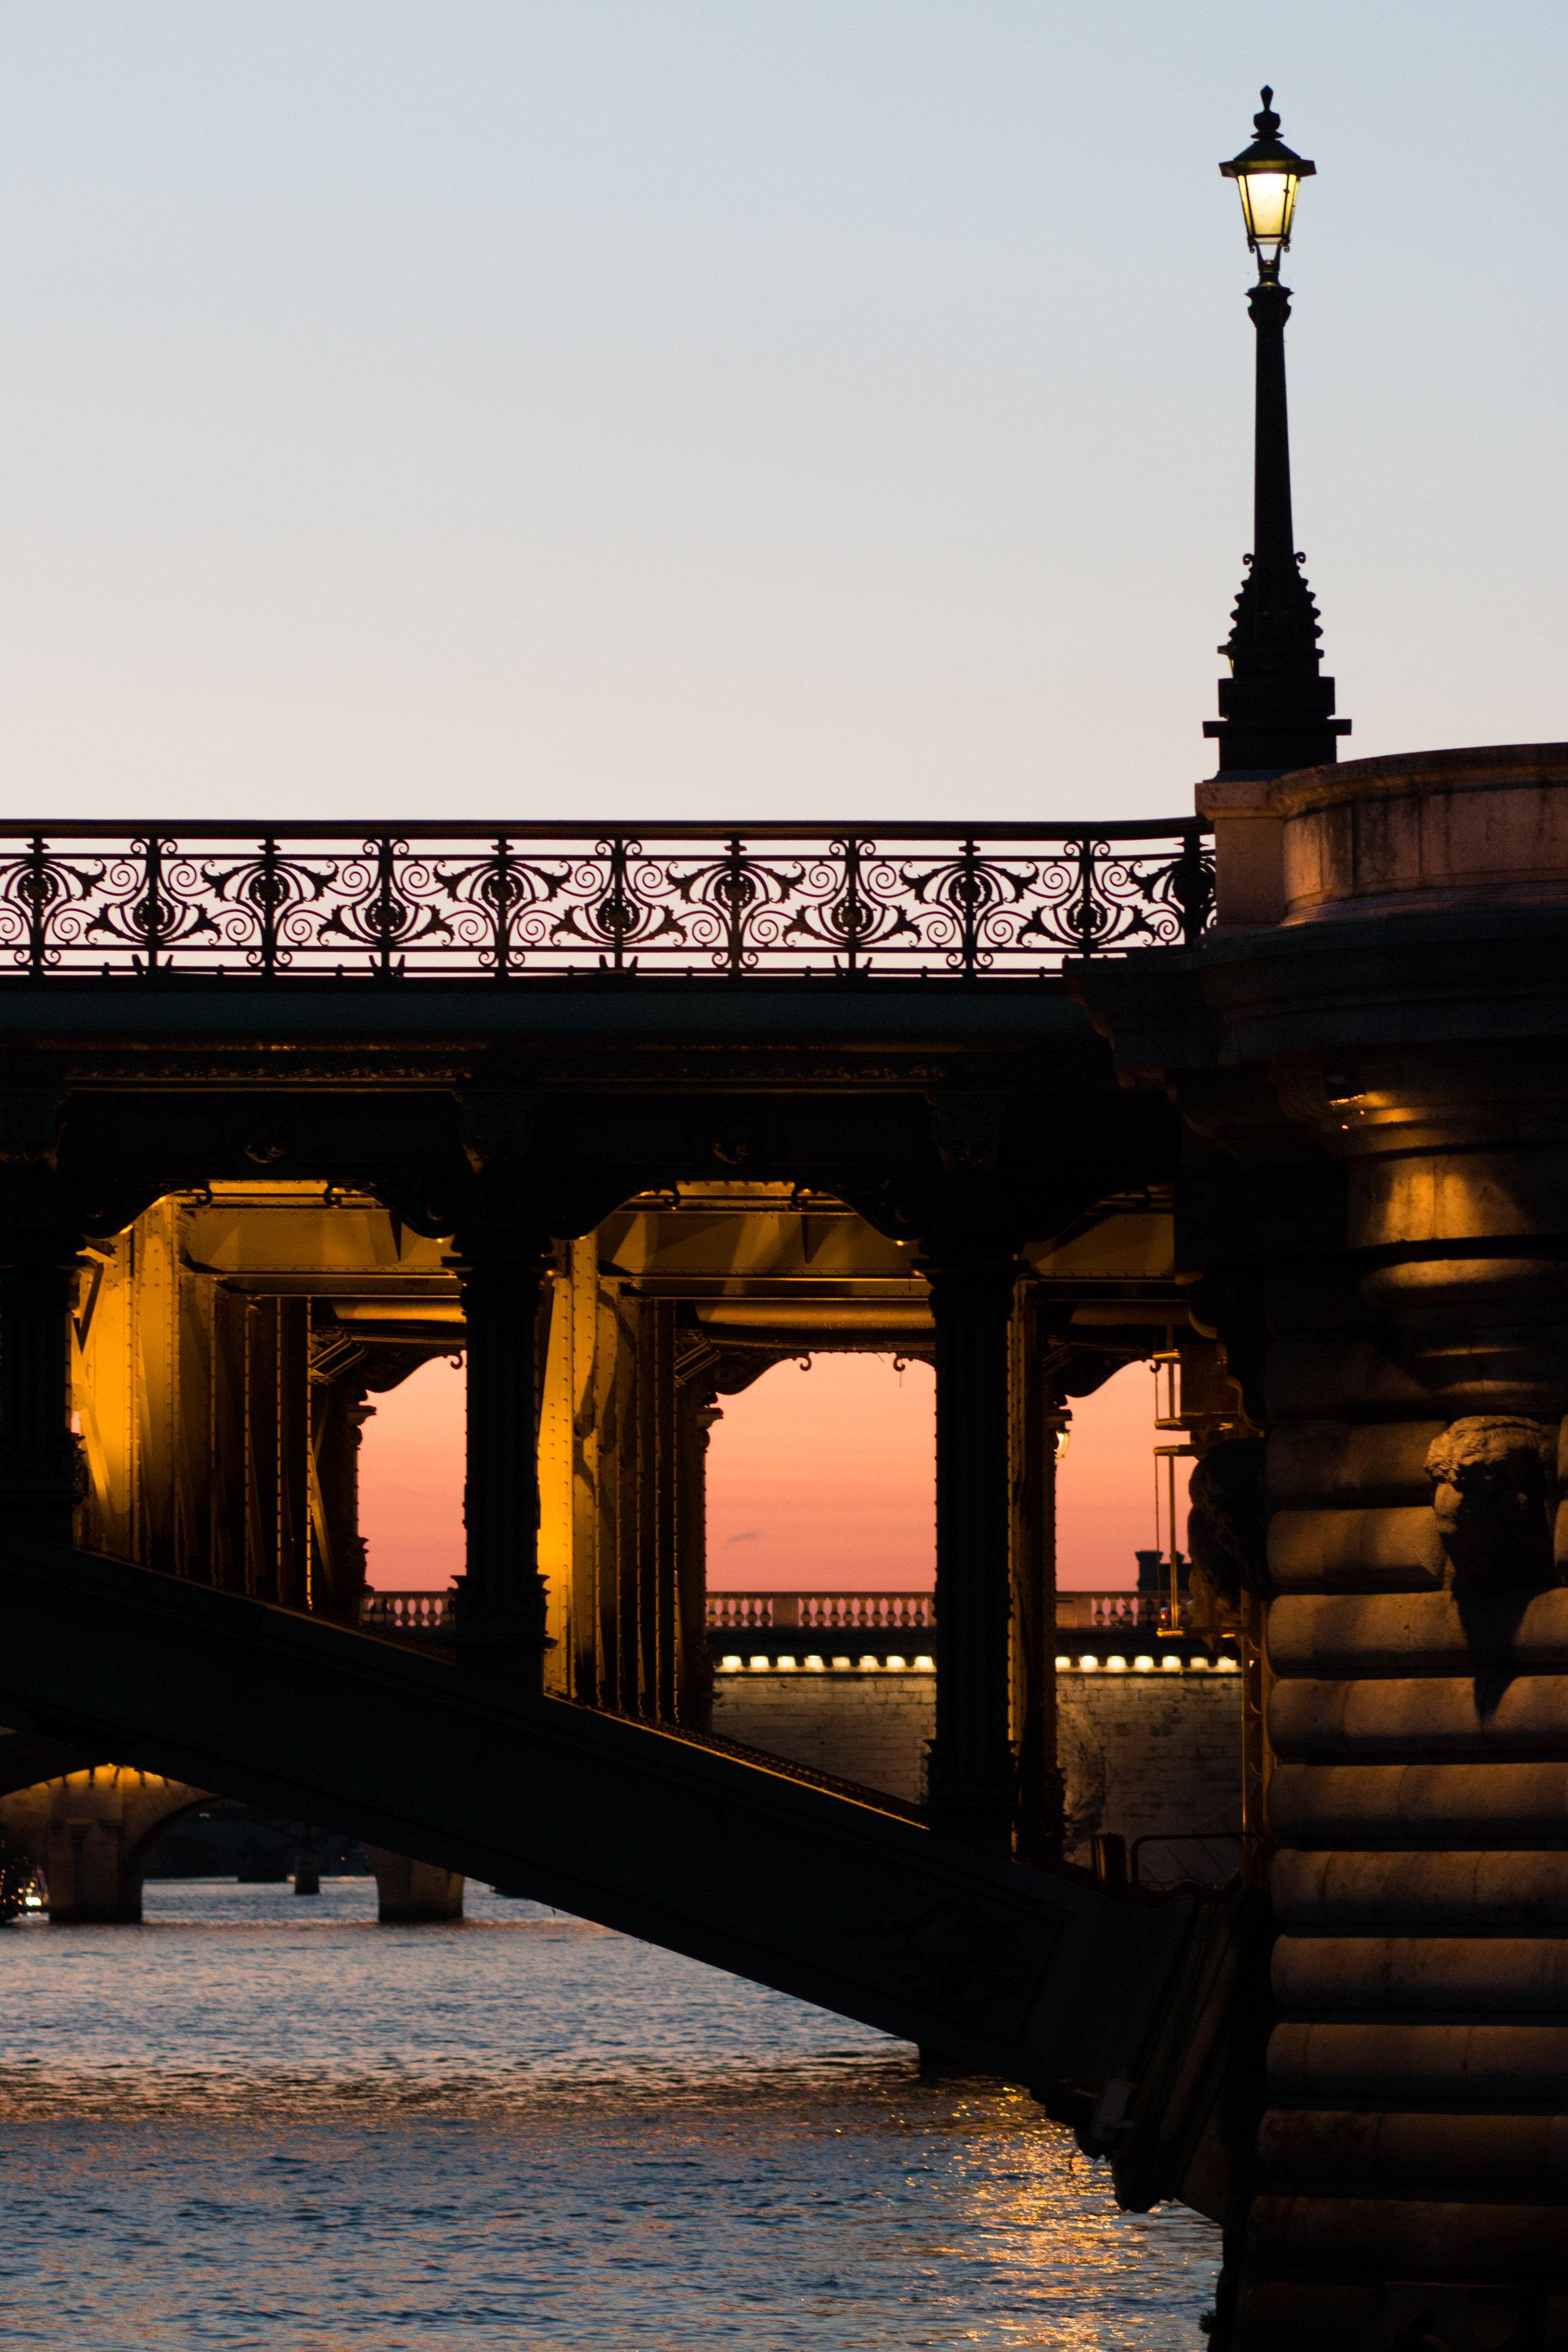 sunset stroll on the seine in paris france